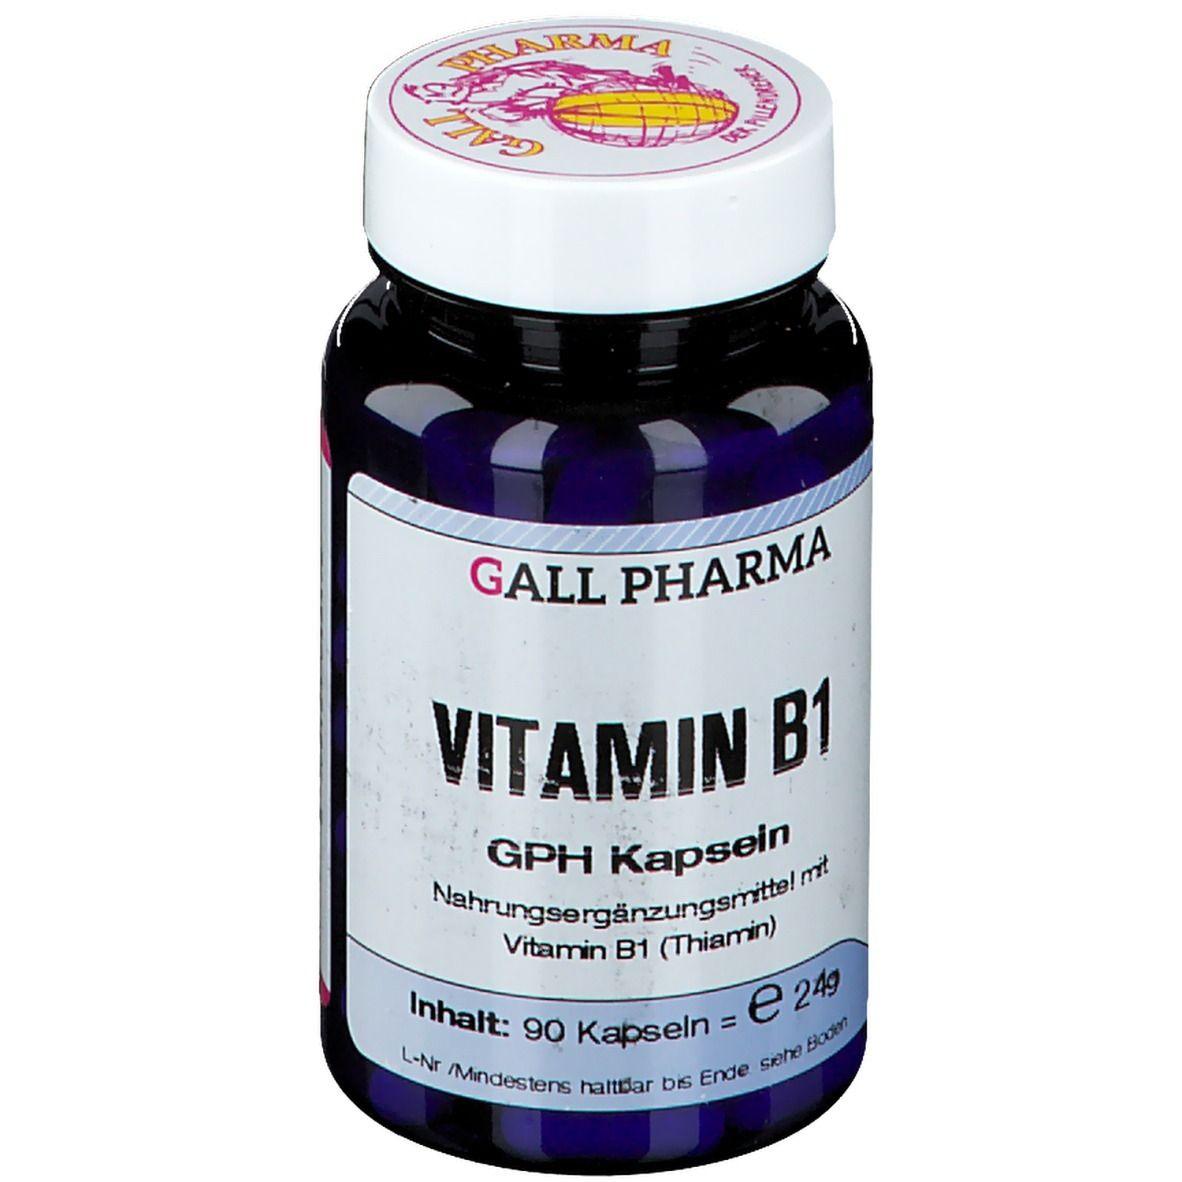 GALL PHARMA Vitamin B1 1,4 mg GPH